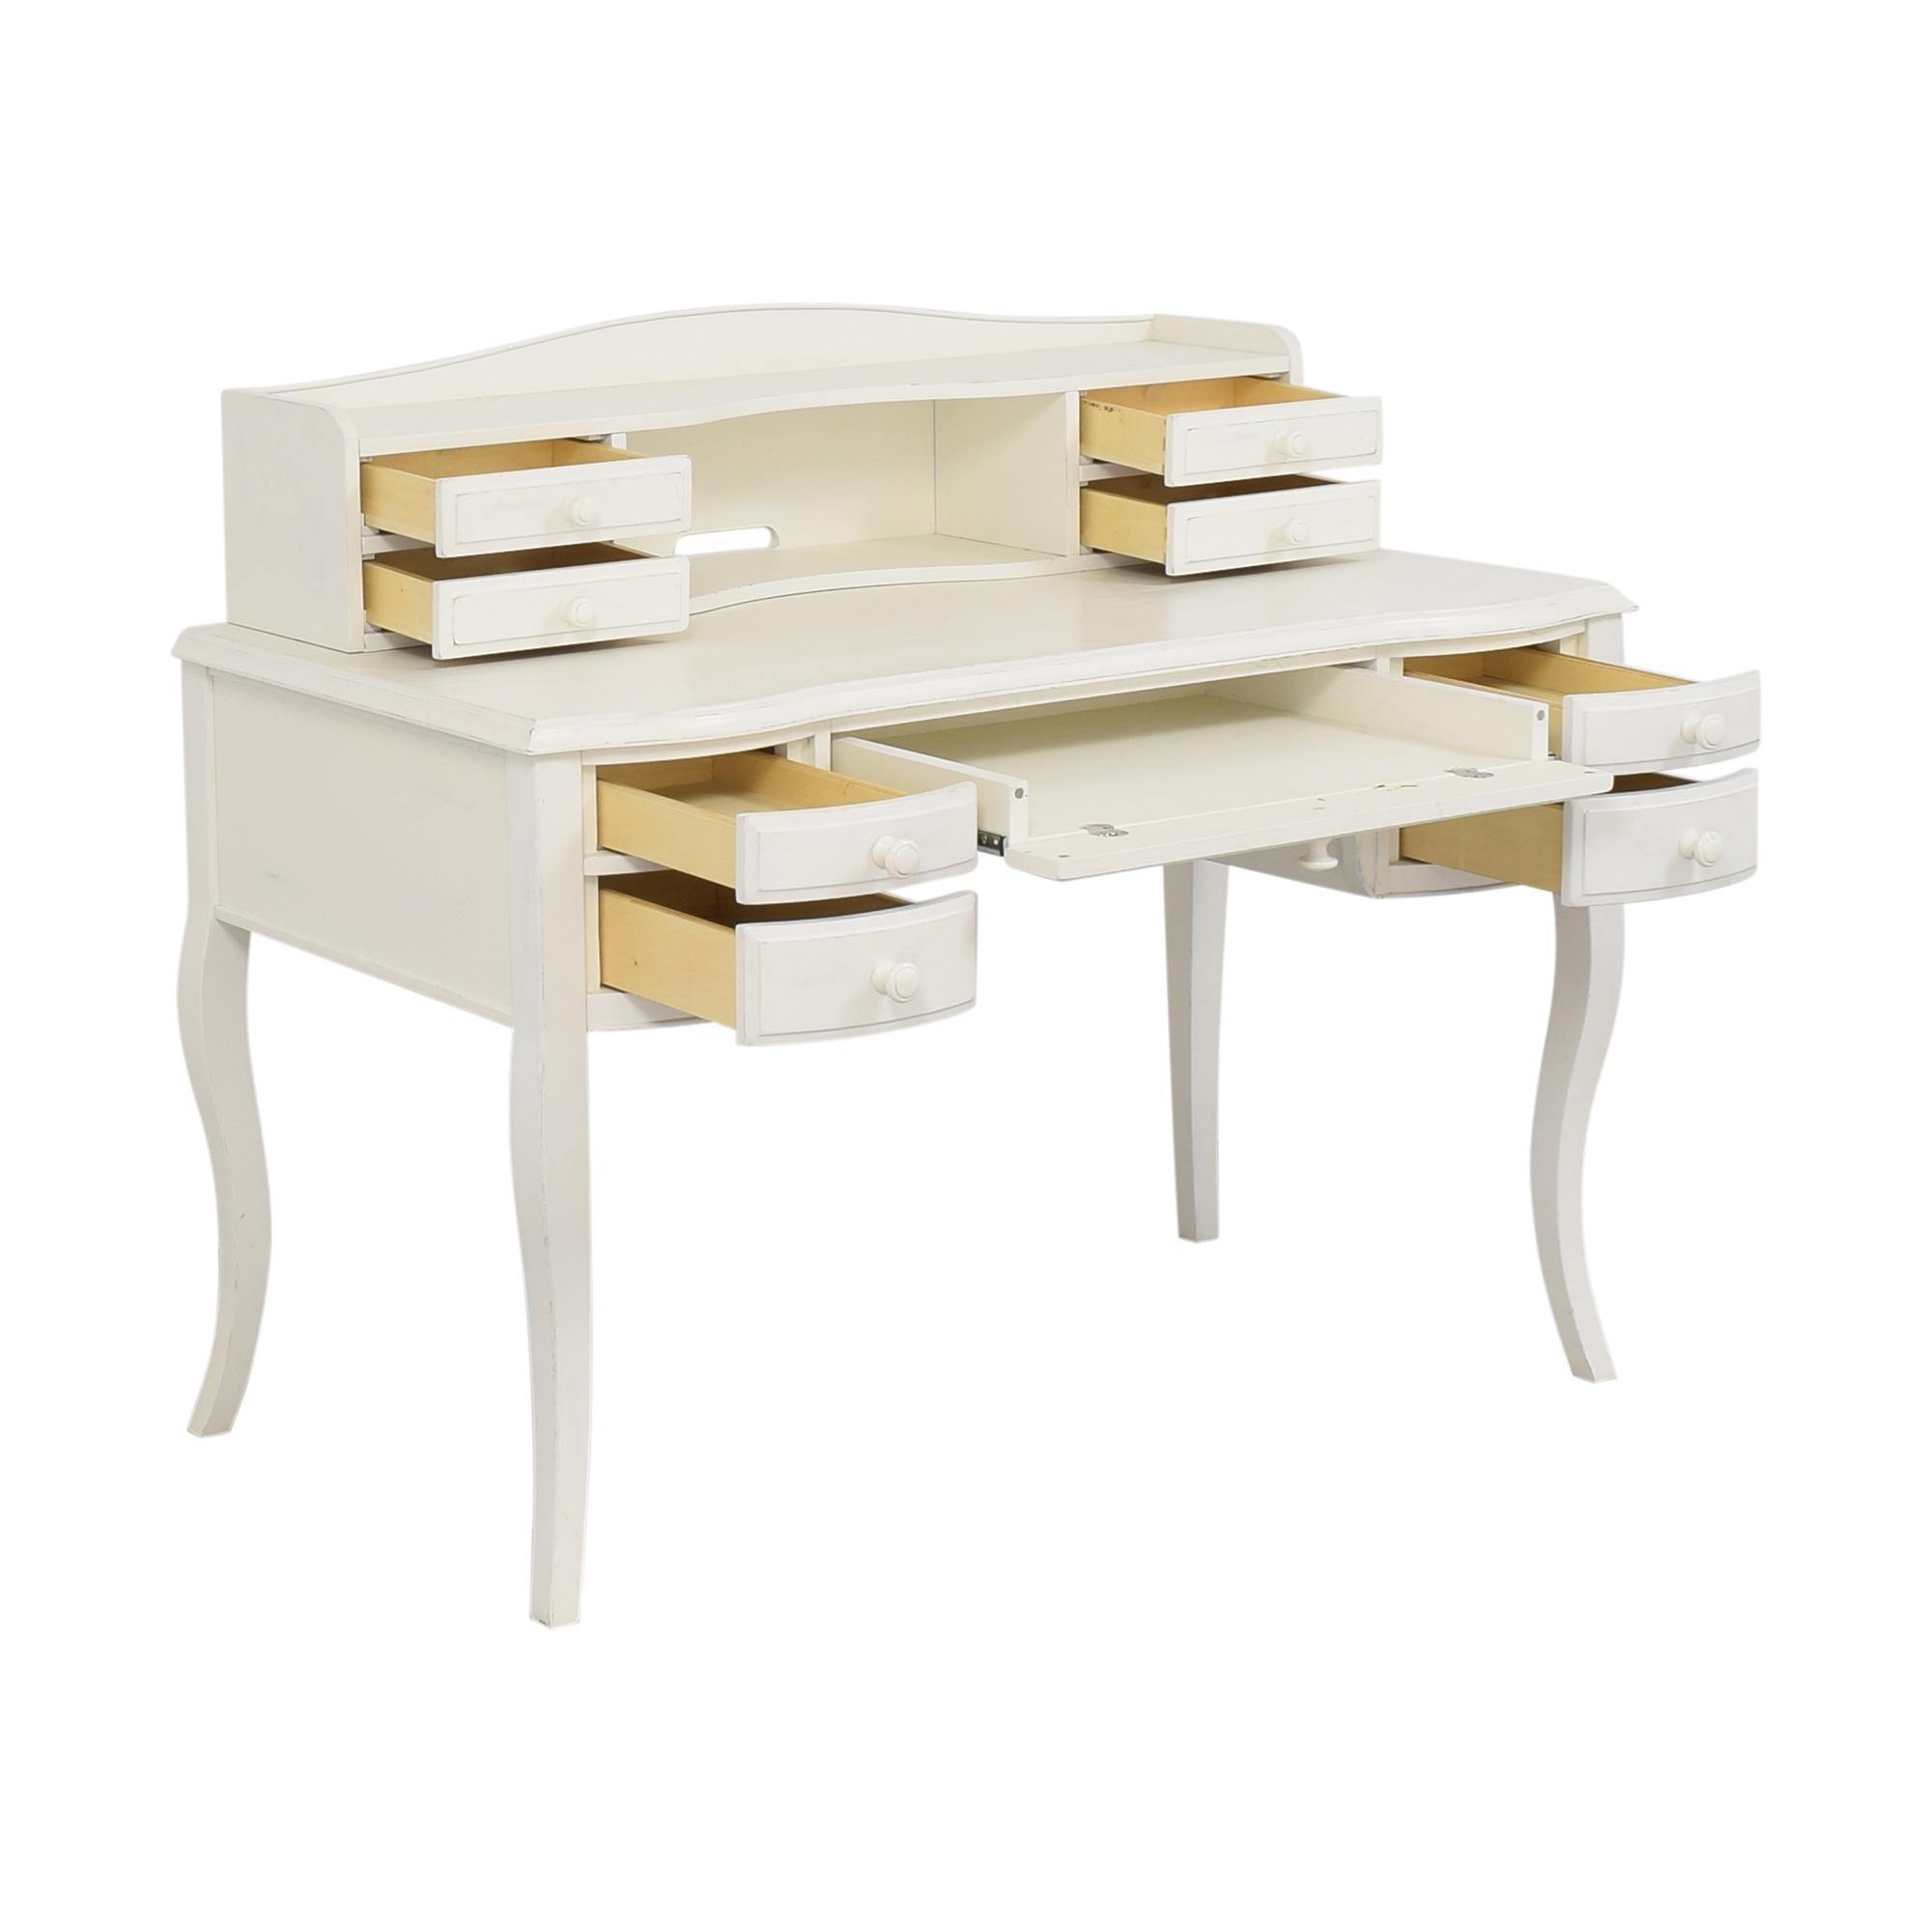 Pottery Barn Teen Pottery Barn Teen Lilac Classic Desk with Hutch nj